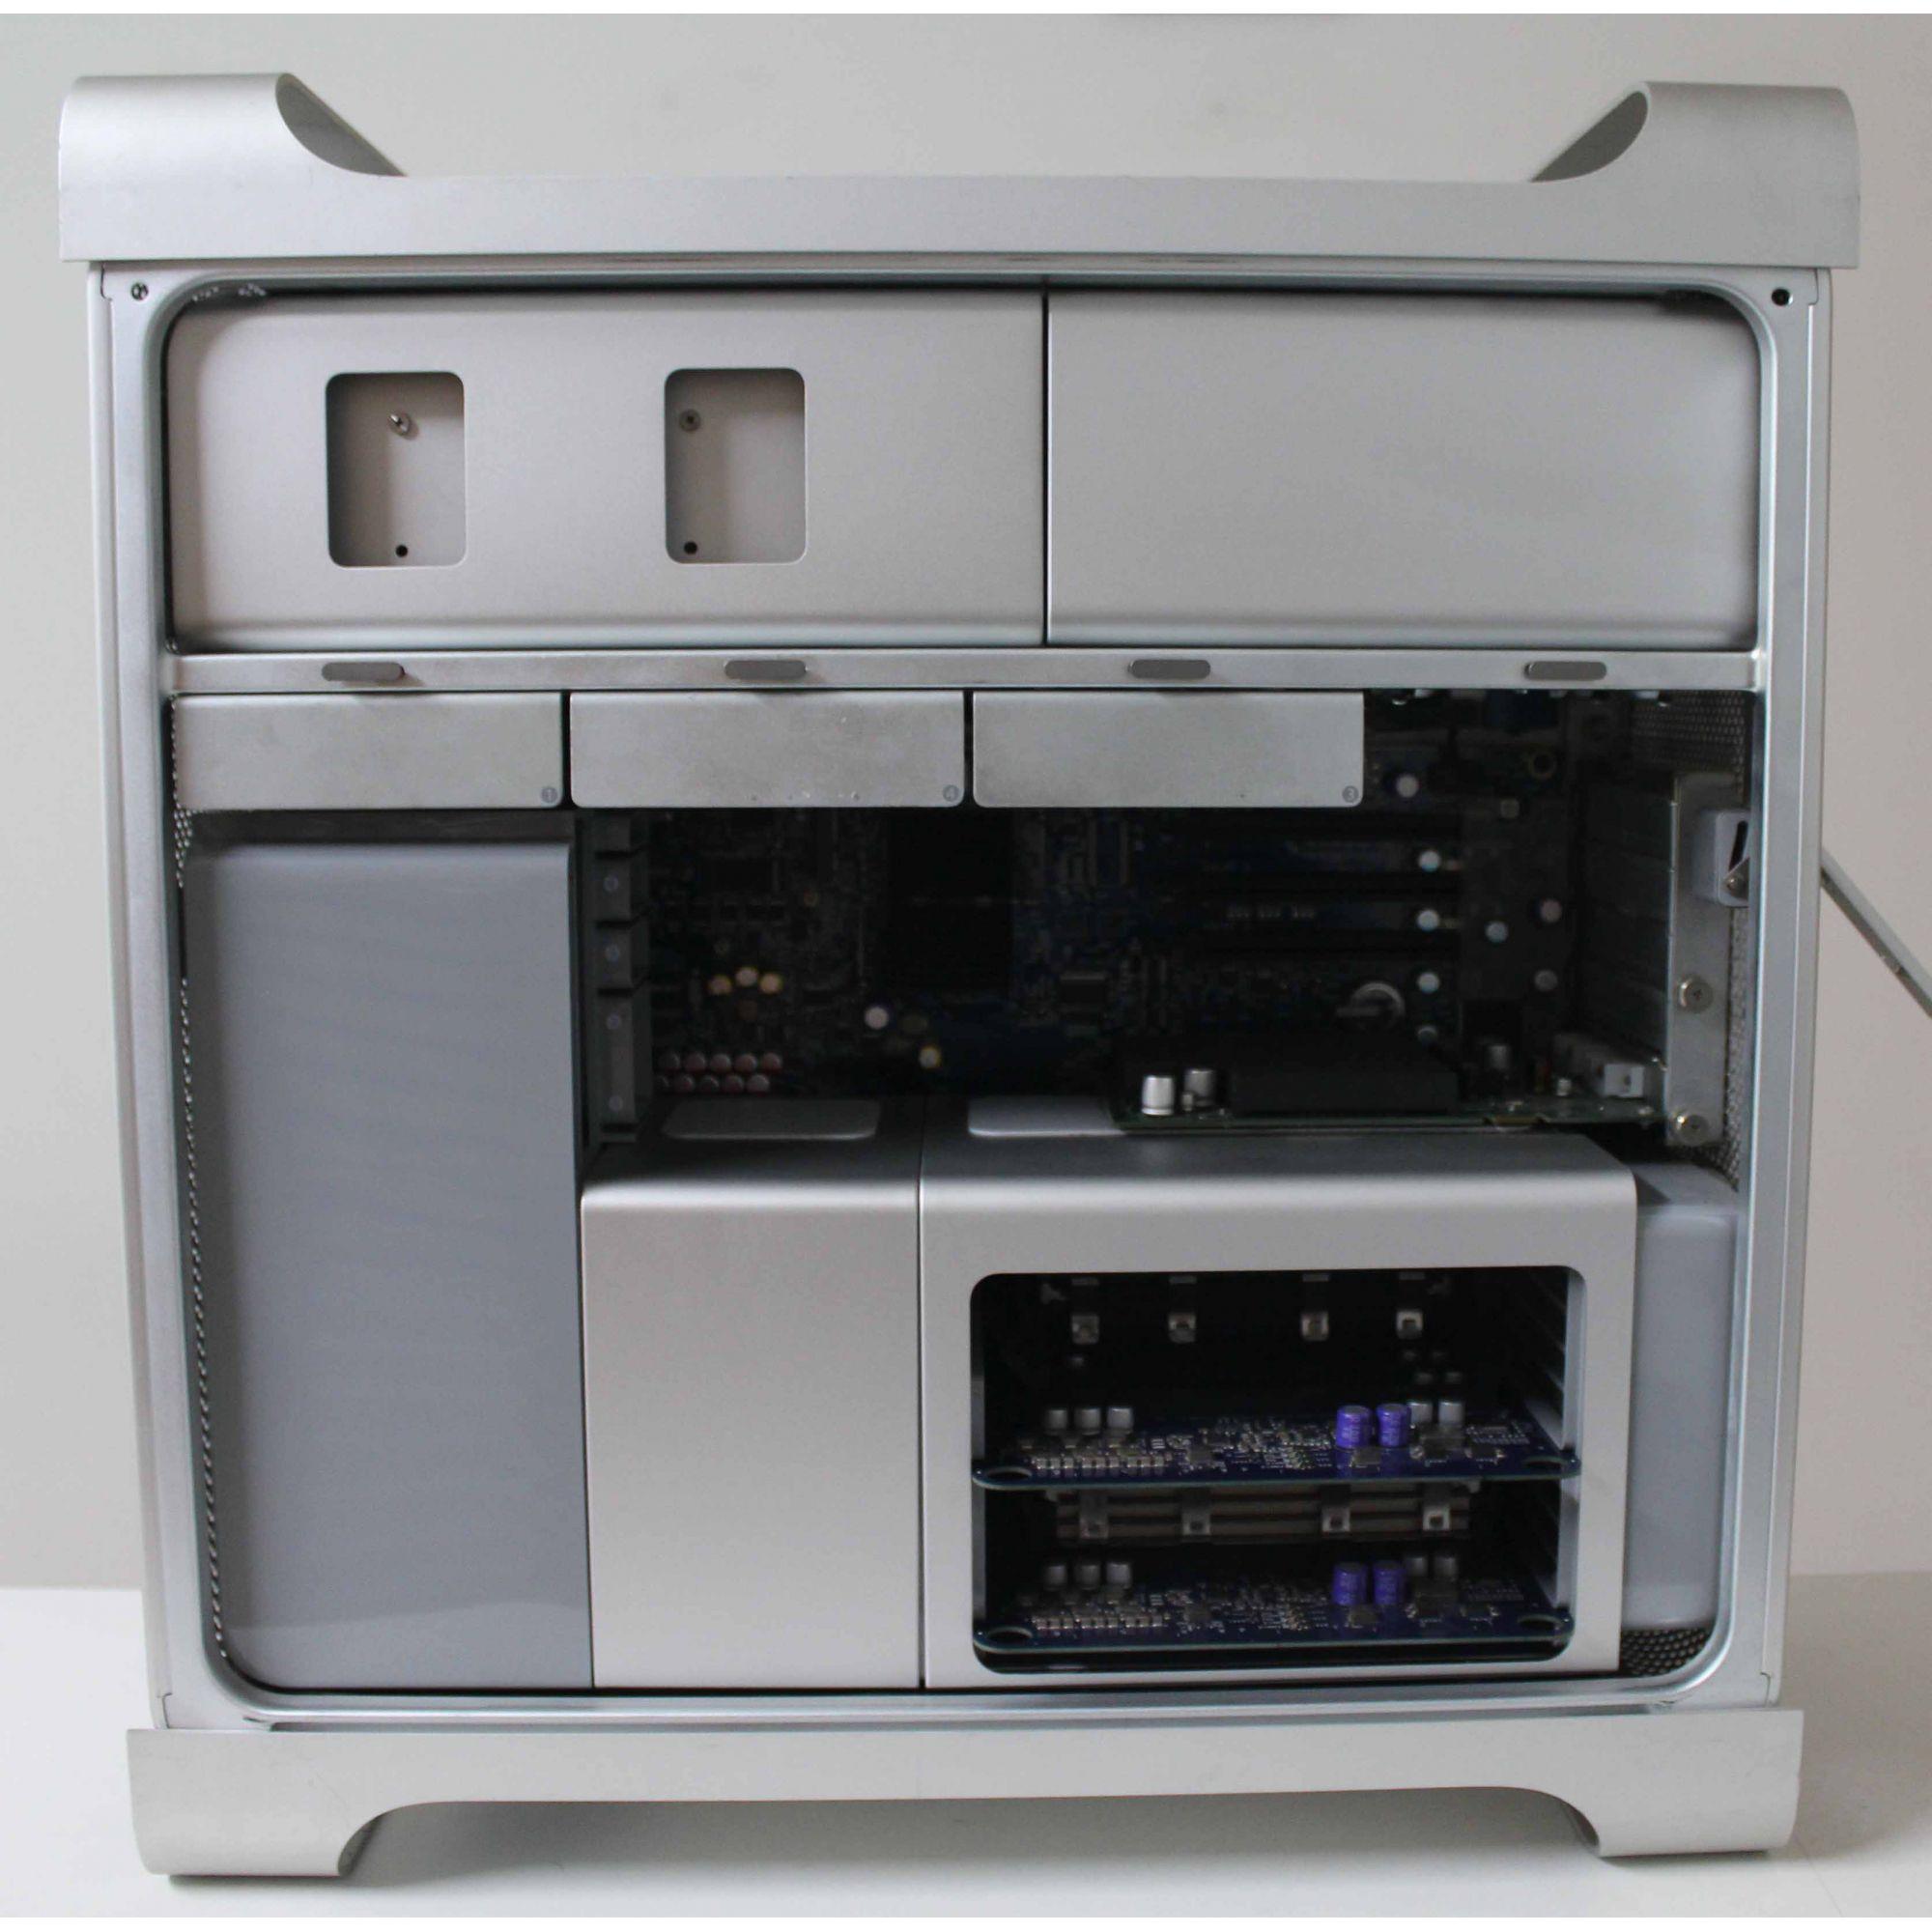 Mac Pro MA356LL/A 2x Intel Xenon Dual Core 2.6GHz 4GB 250GB